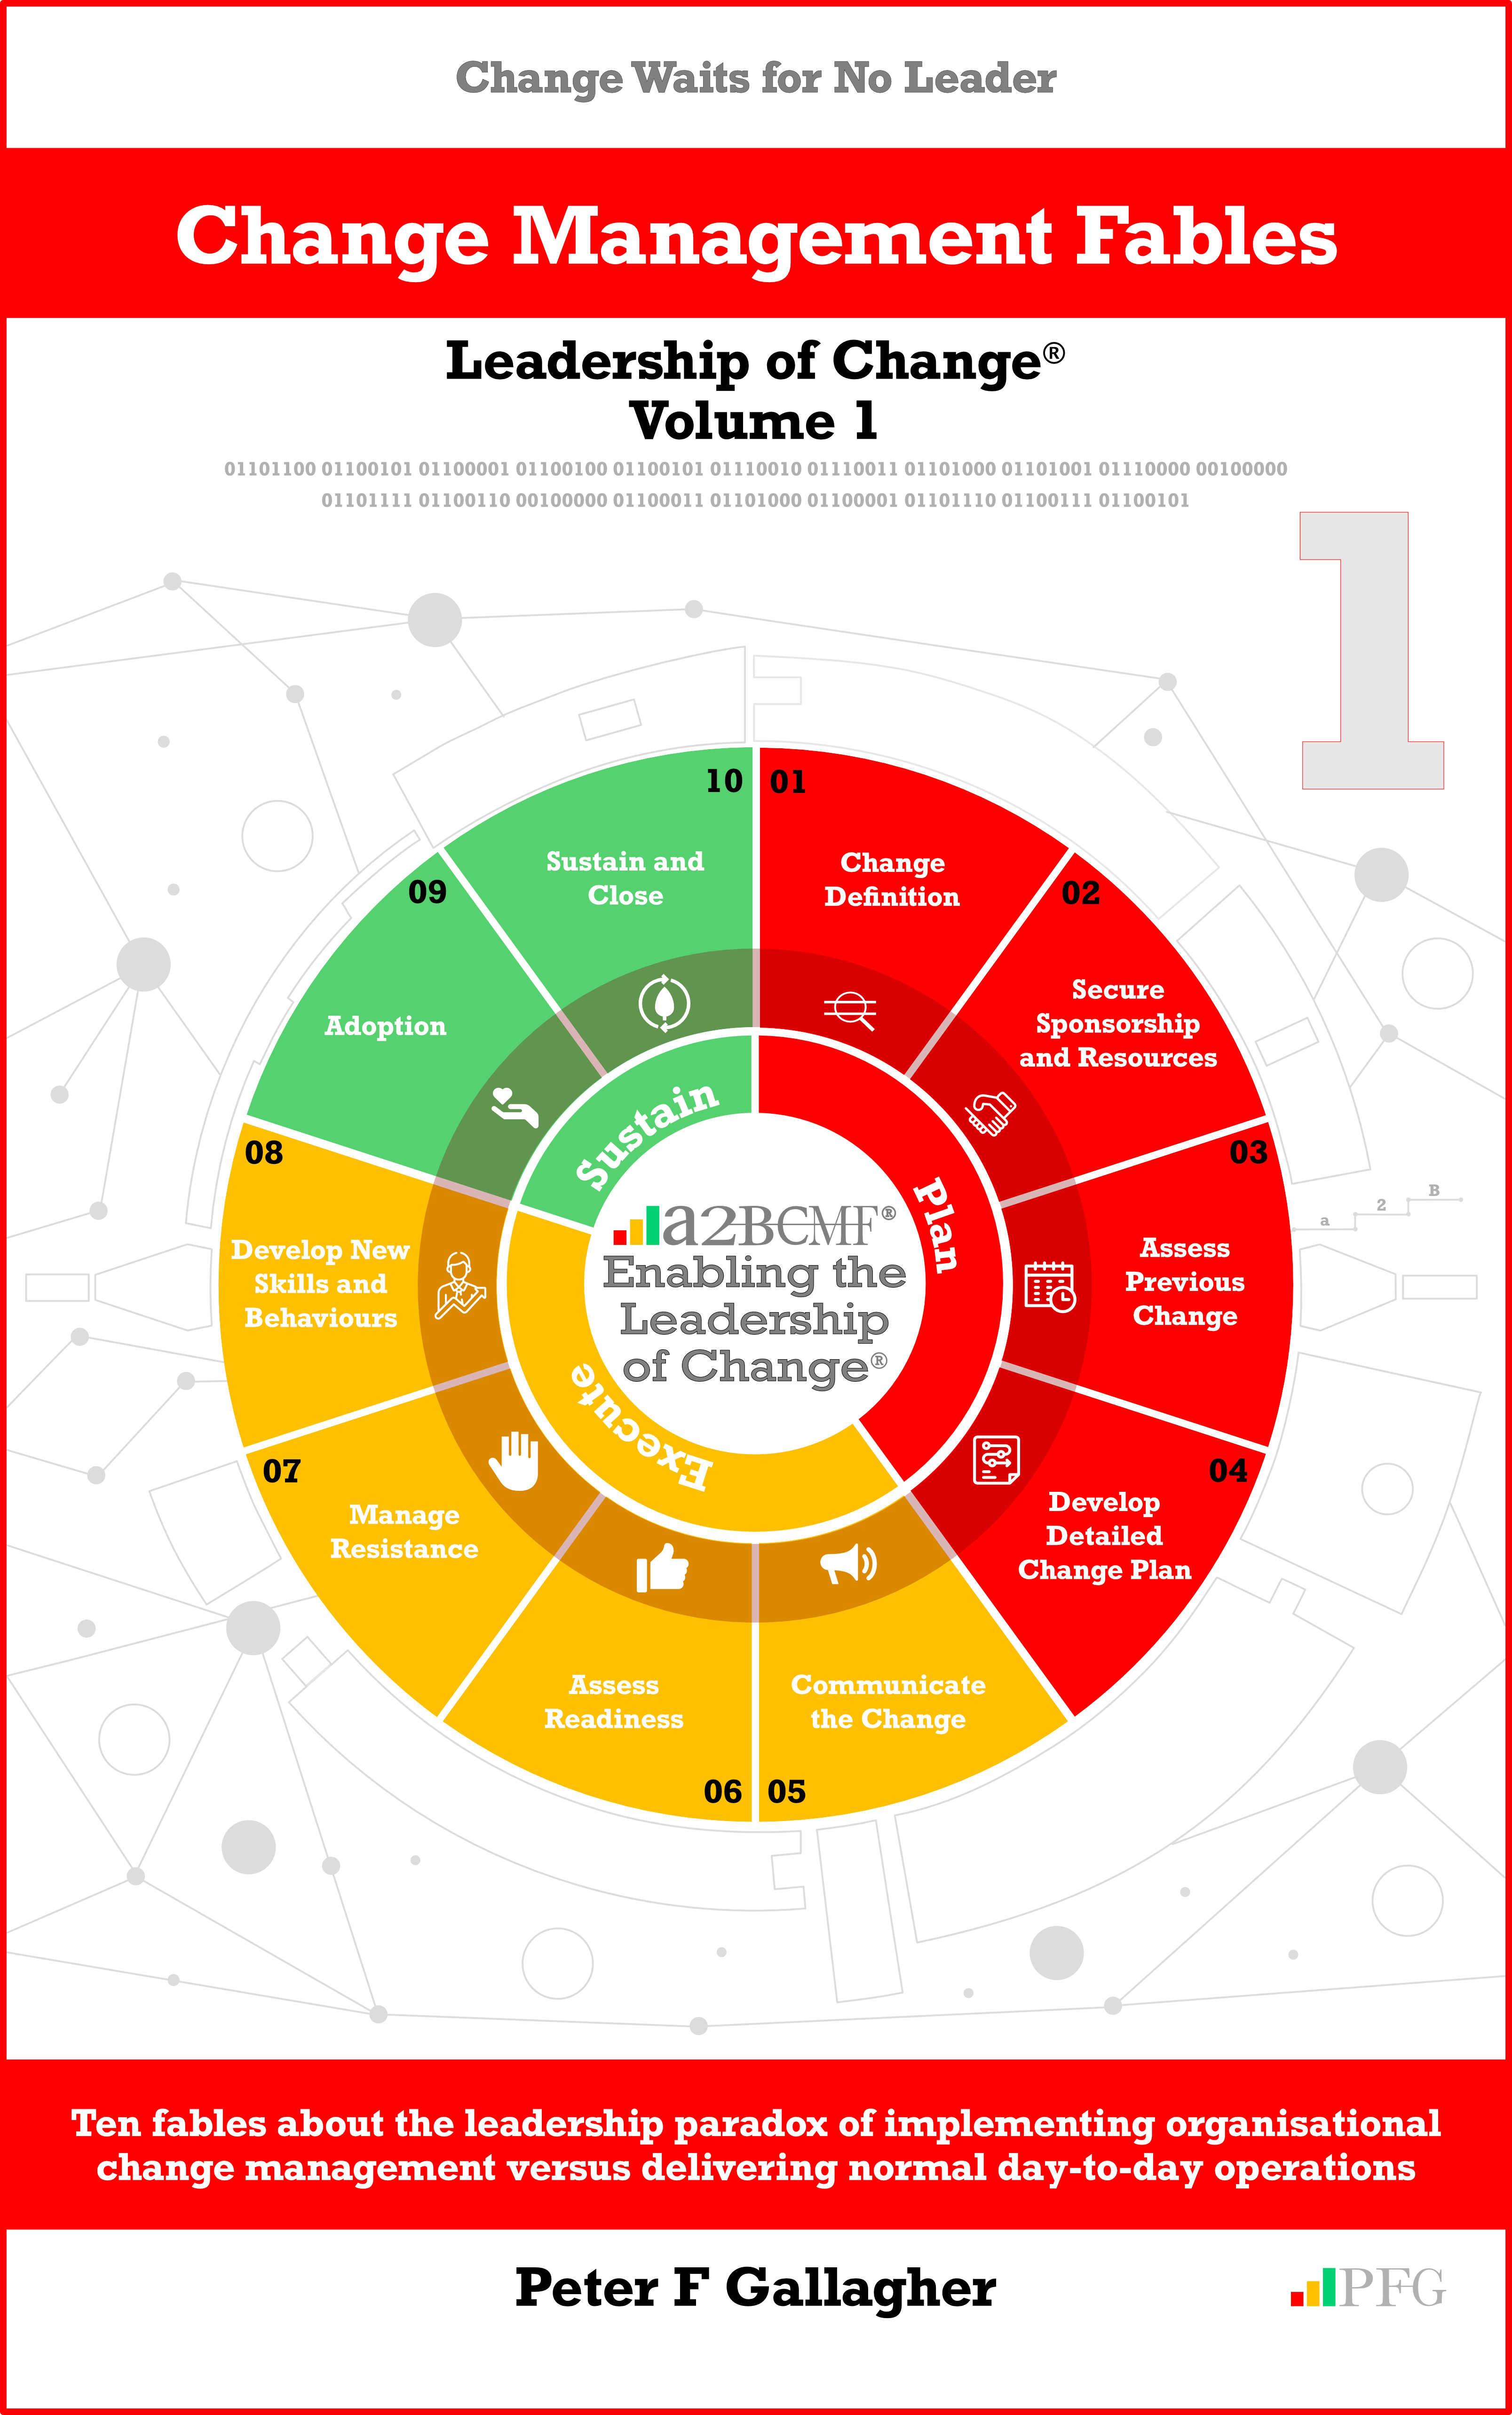 Change Management Fables, Leadership of Change Volume 1 Change Management Fables, www.PeterFgallaghe